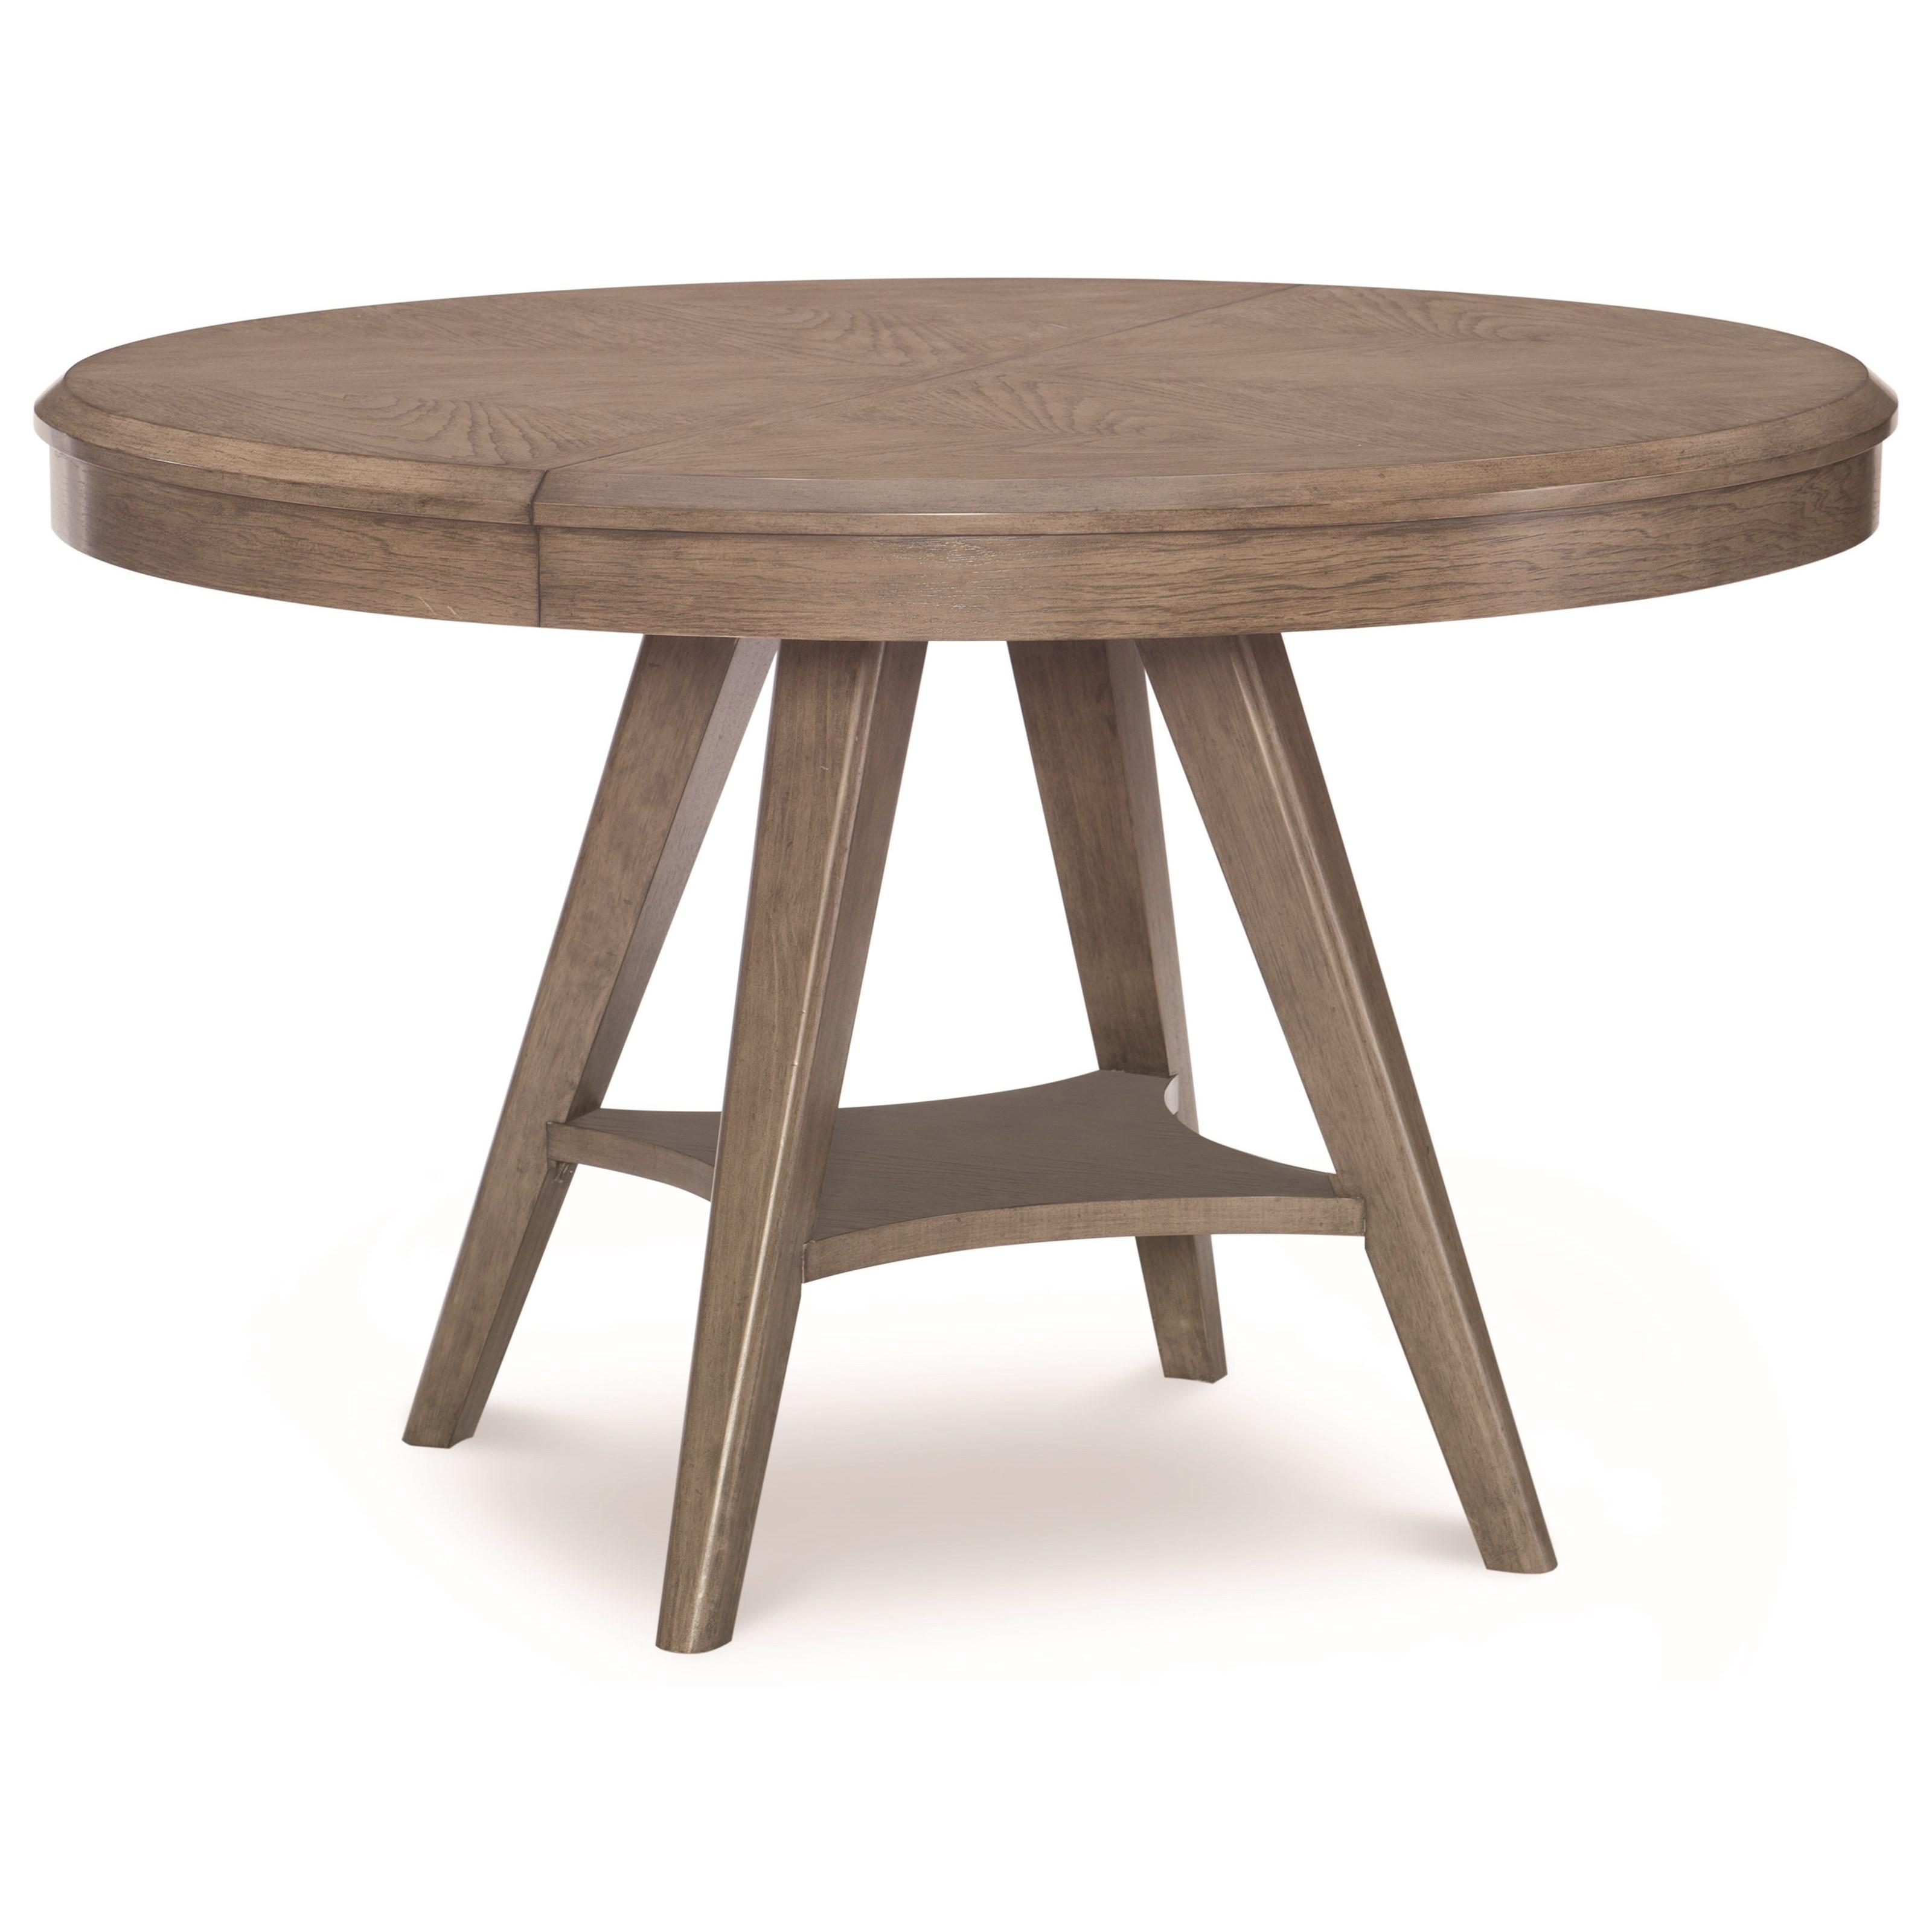 Attirant Legacy Classic ApexRound To Oval Pedestal Table ...